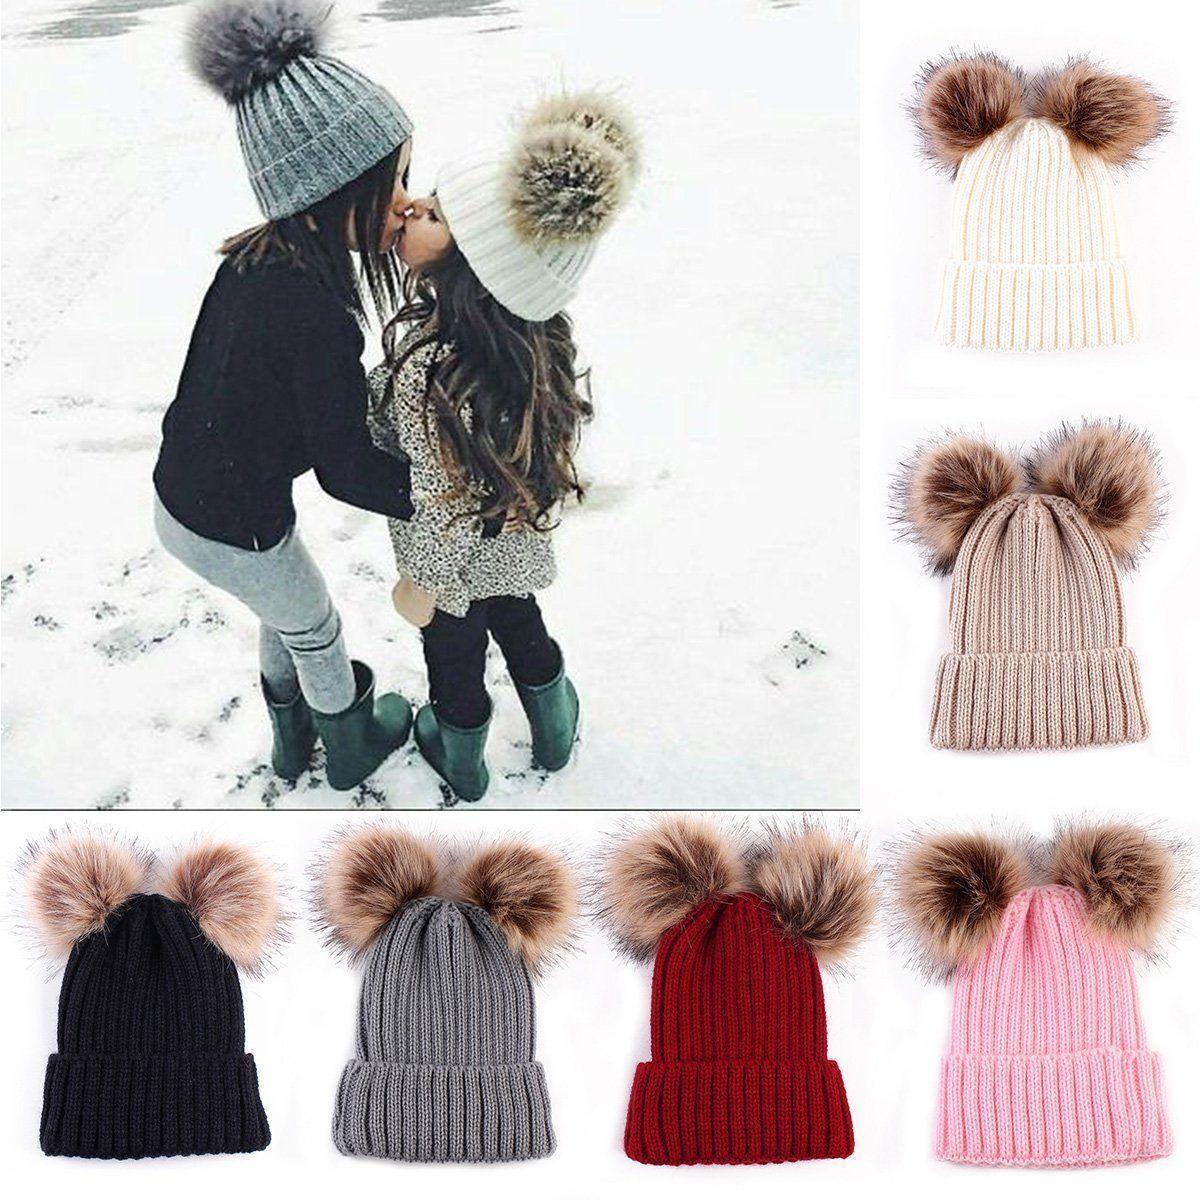 da1d5ab5006 Boy Baby Clothes · Boy Clothing · Mom Lady Women Girls Winter Warm Double  Fur Pom Bobble Knit Beanie Hat Cap